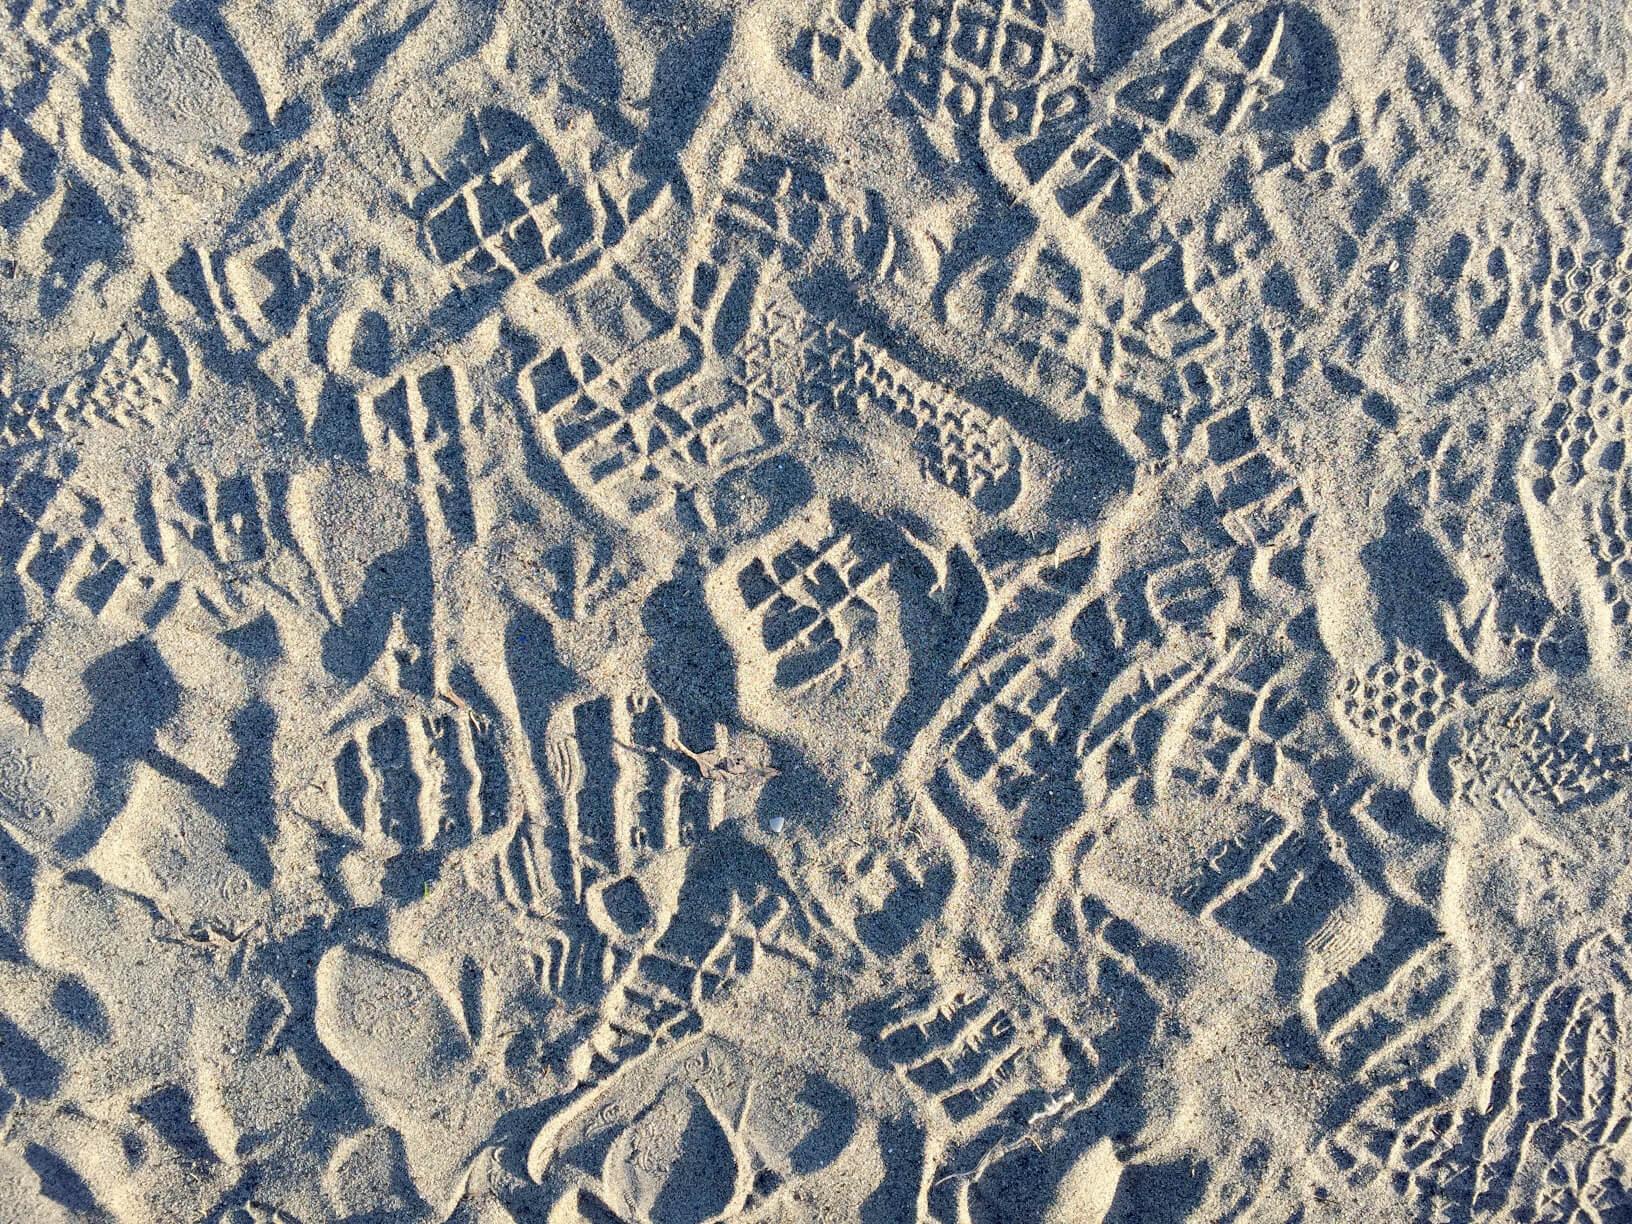 Foot Prints San Francisco